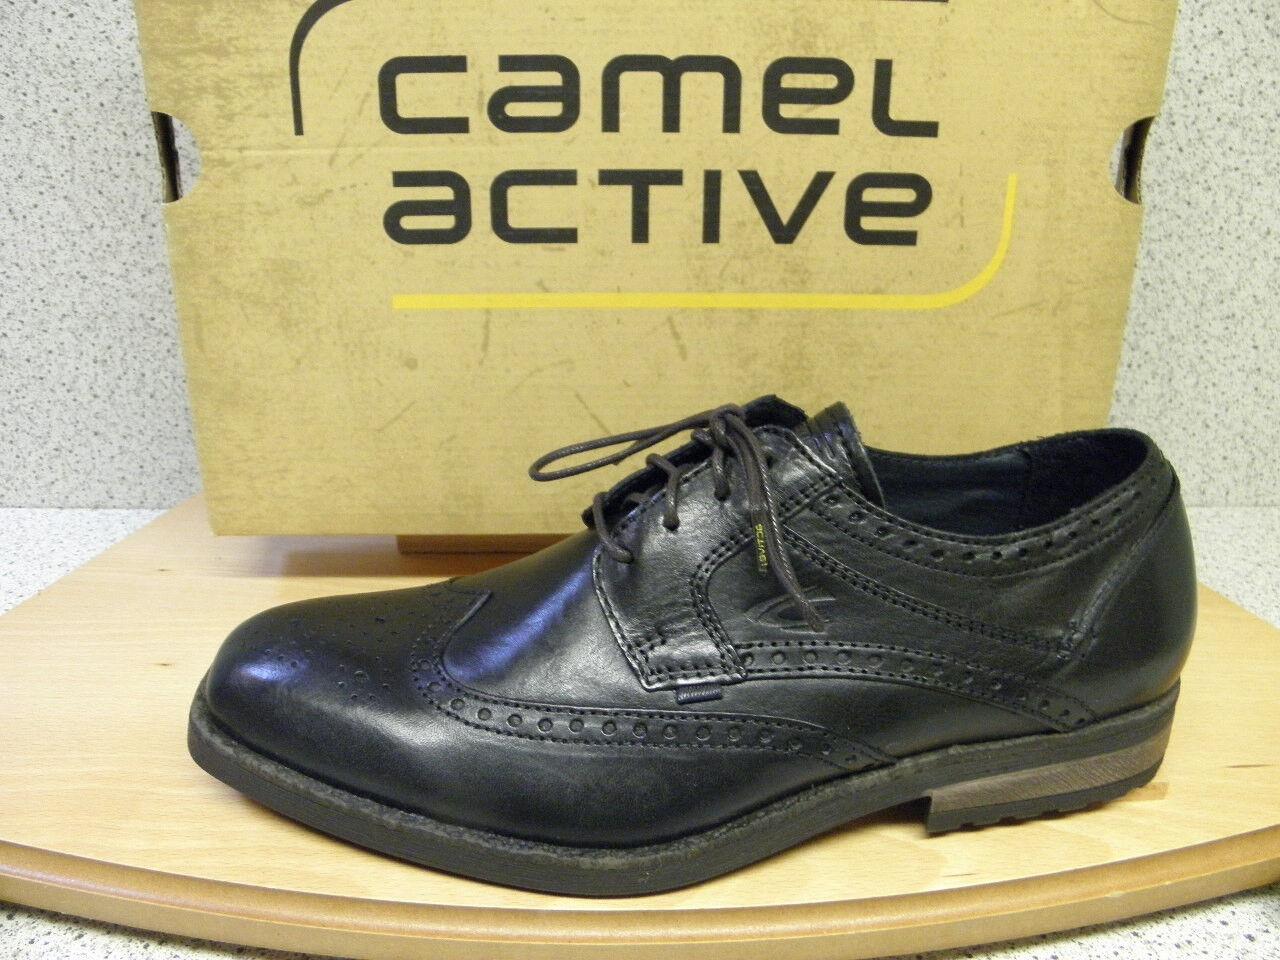 camel active ® SALE, bisher 119,95 €